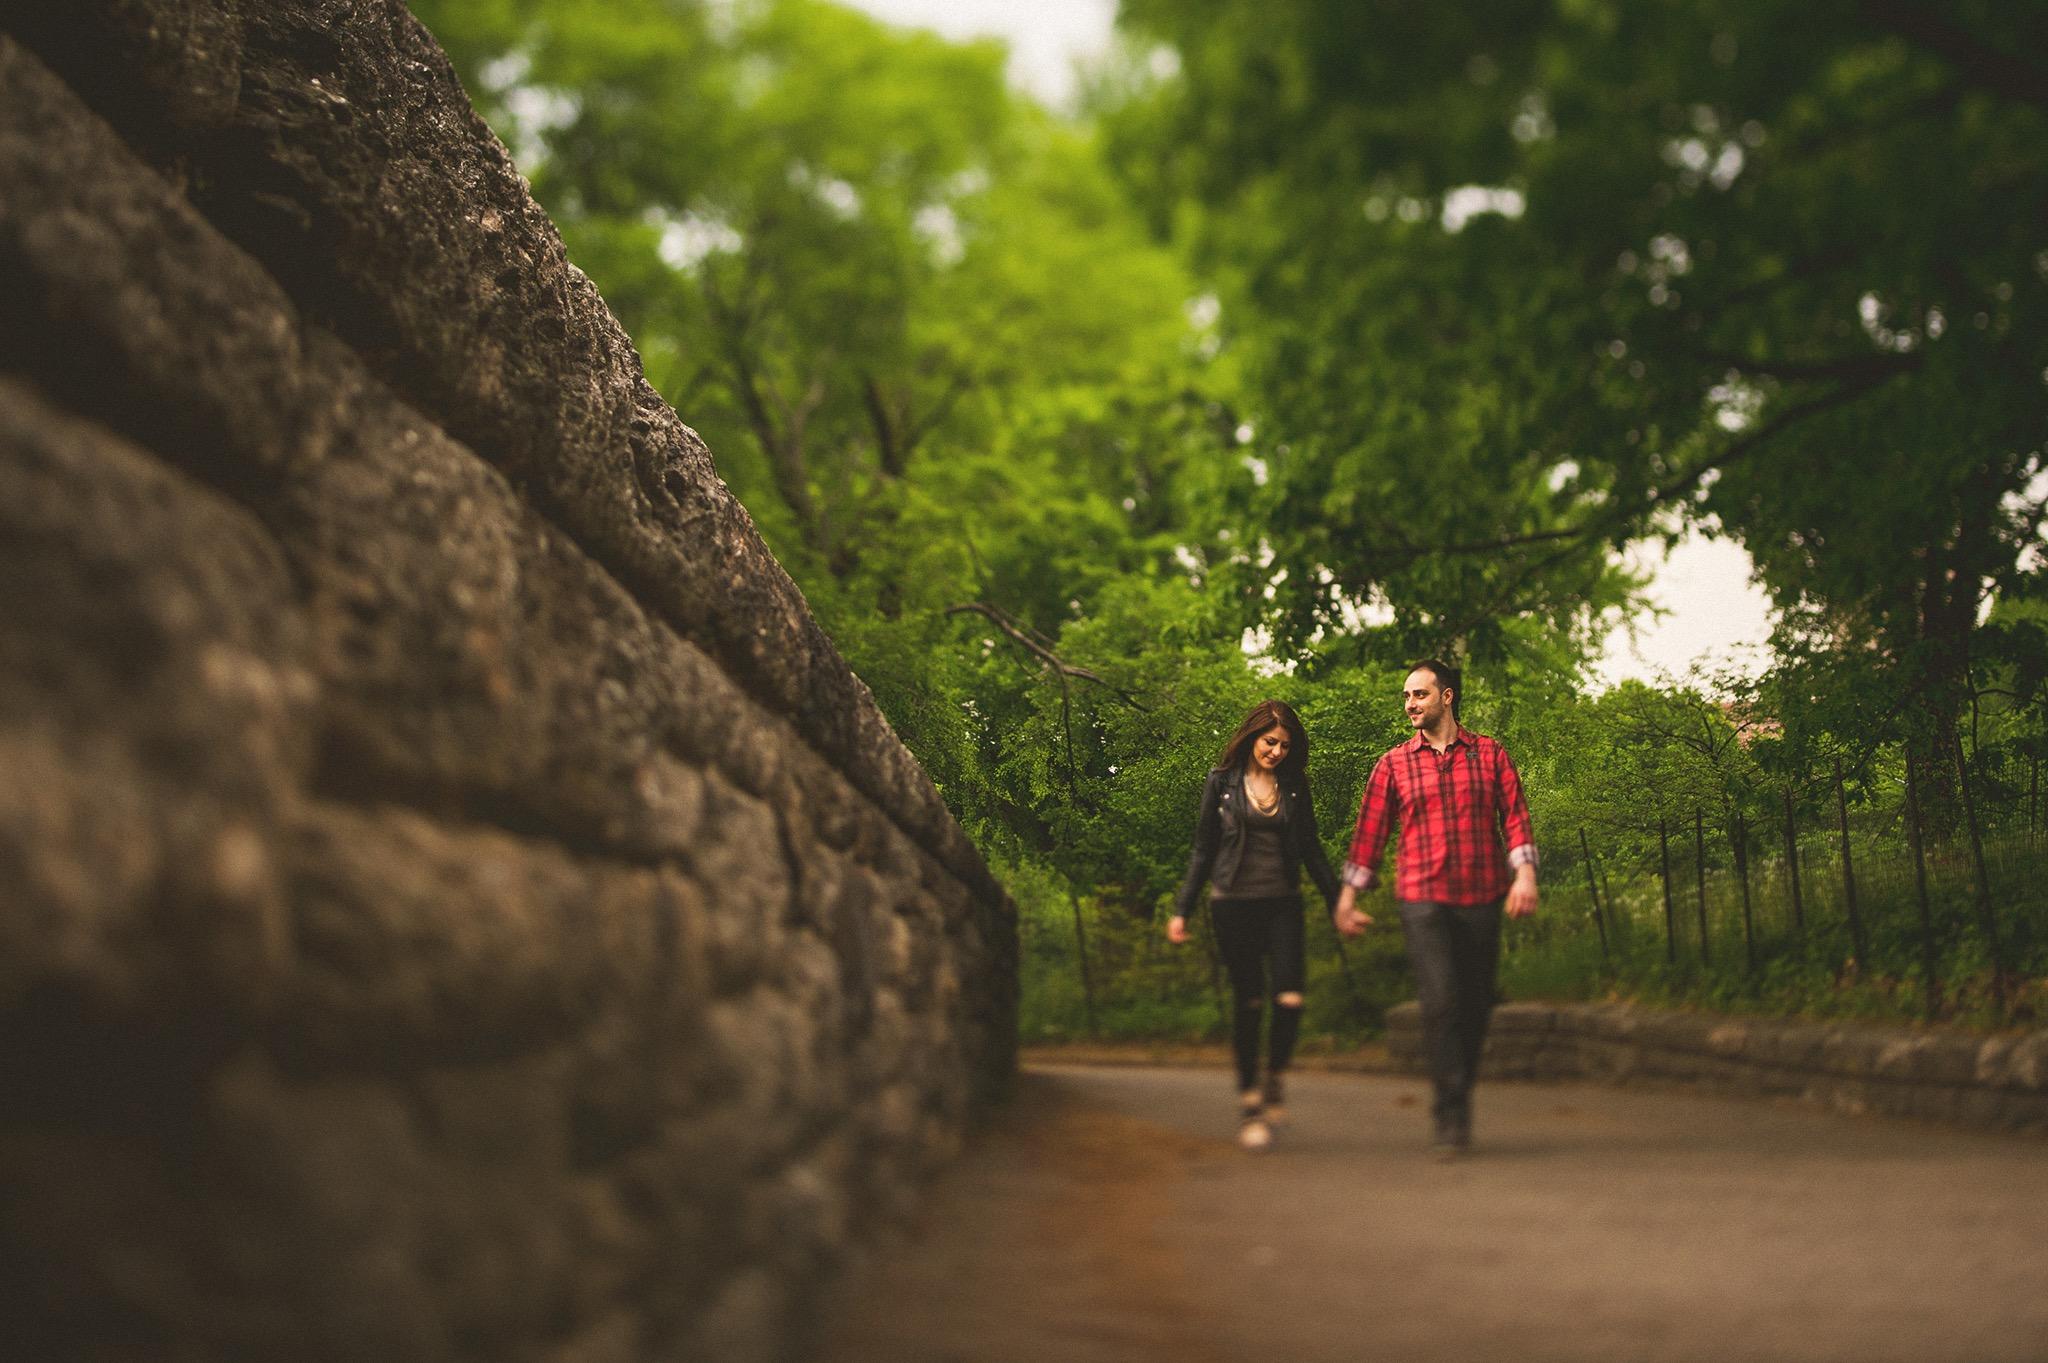 08-couple-walking-tiltshift.jpg